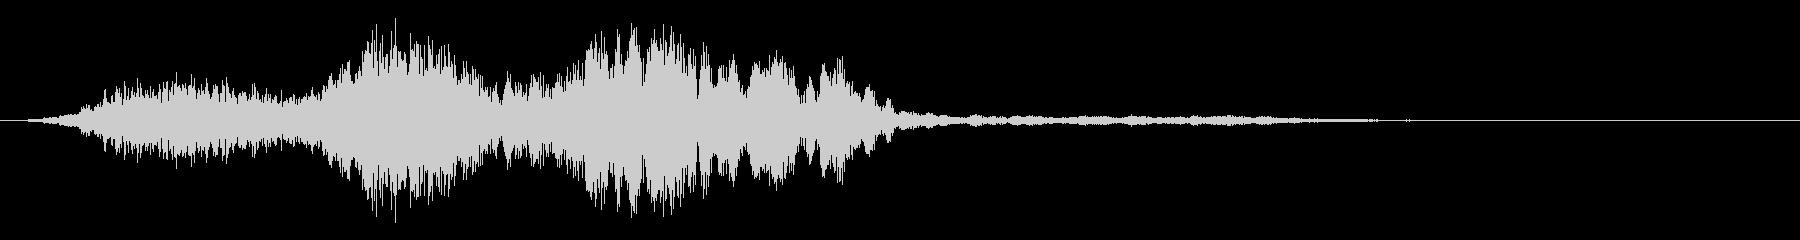 WHOOSHによる追加の悲鳴1の未再生の波形